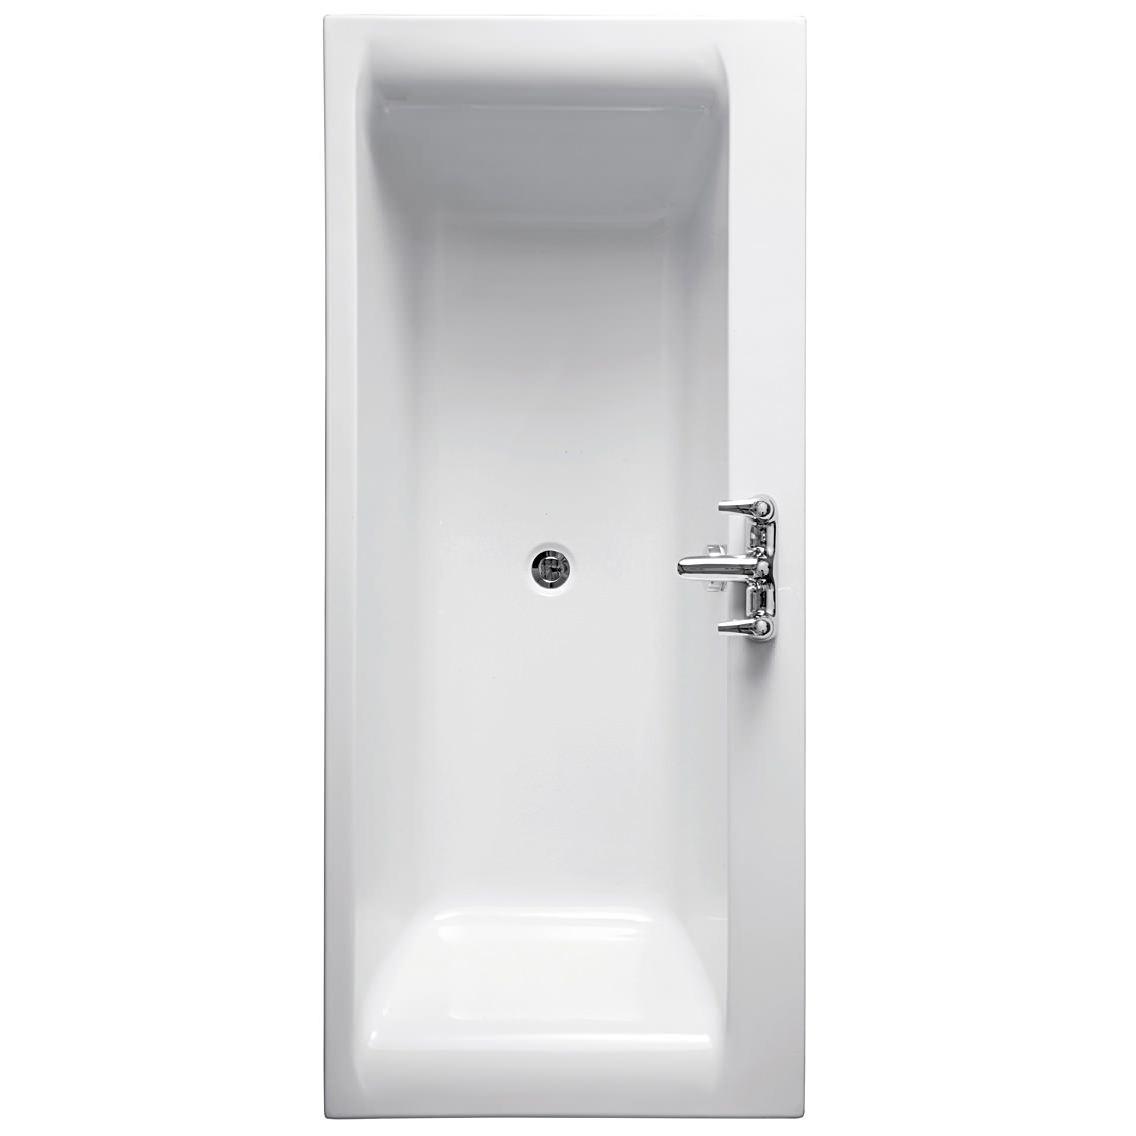 Ideal Standard Alto 1700 X 750mm Double Ended Idealform Bath No Tapholes